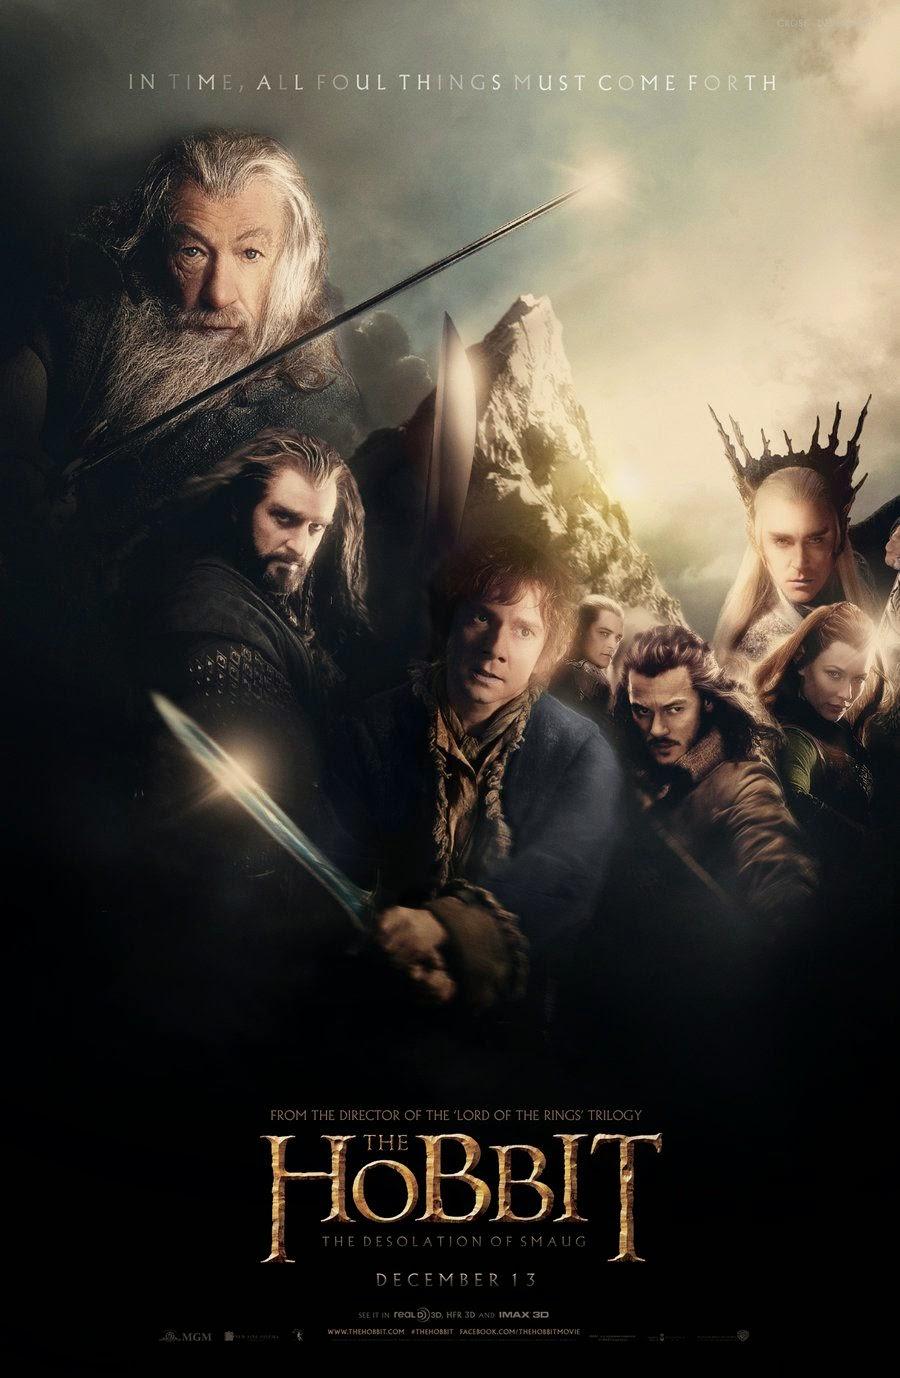 The Hobbit:The Desolation of Smaug เดอะ ฮอบบิท ดินแดนเปลี่ยวร้างของสม็อค [HD]